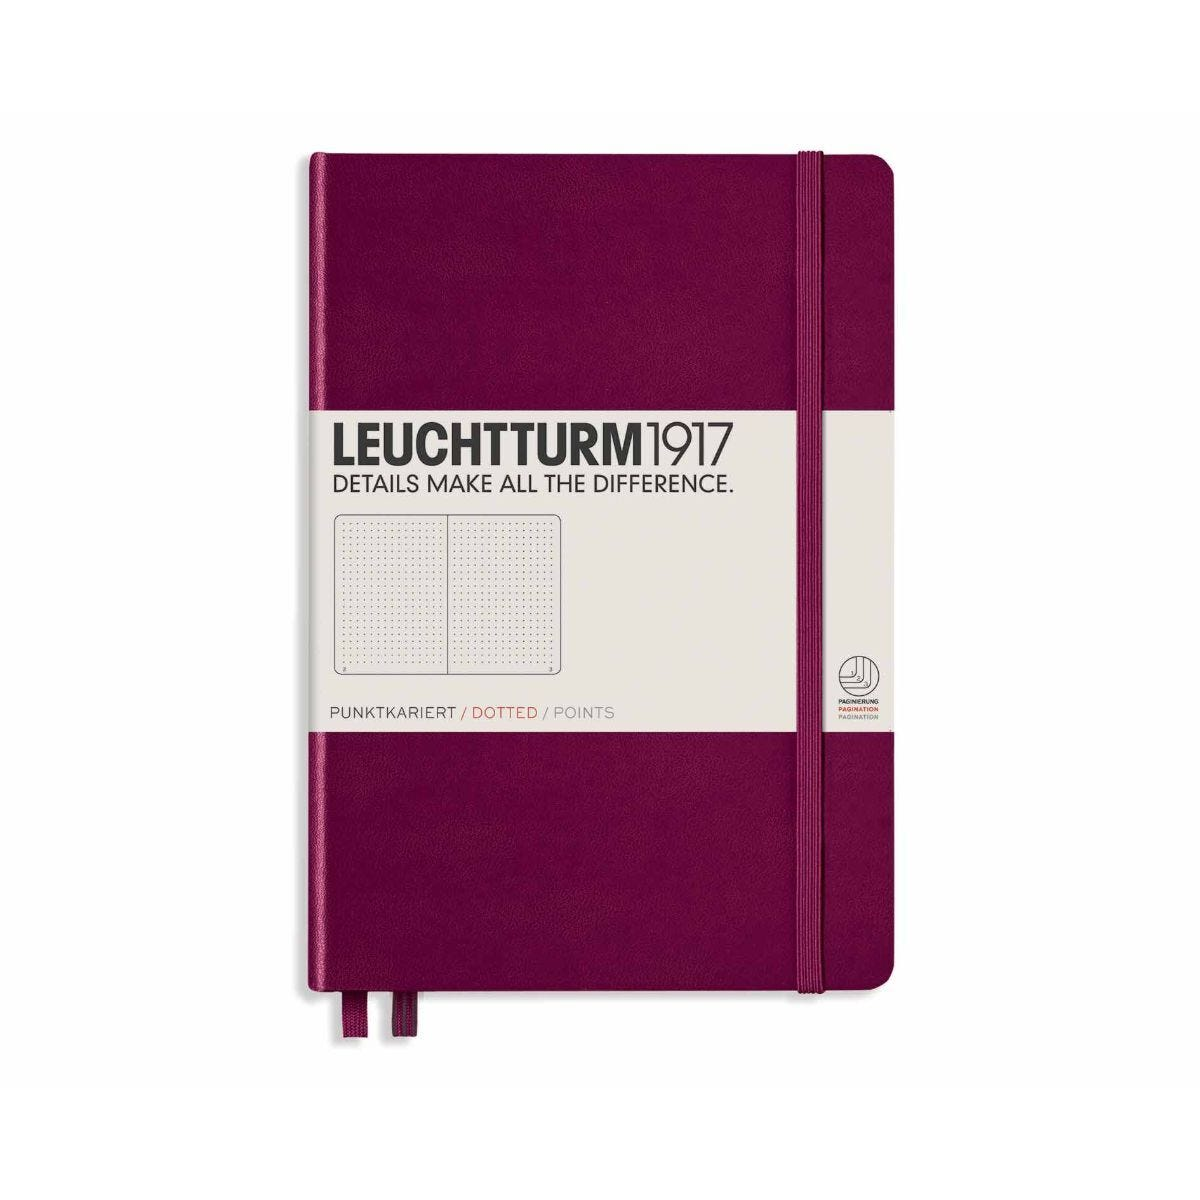 Leuchtturm1917 Hardcover Notedbook Dotted A5 Port Red